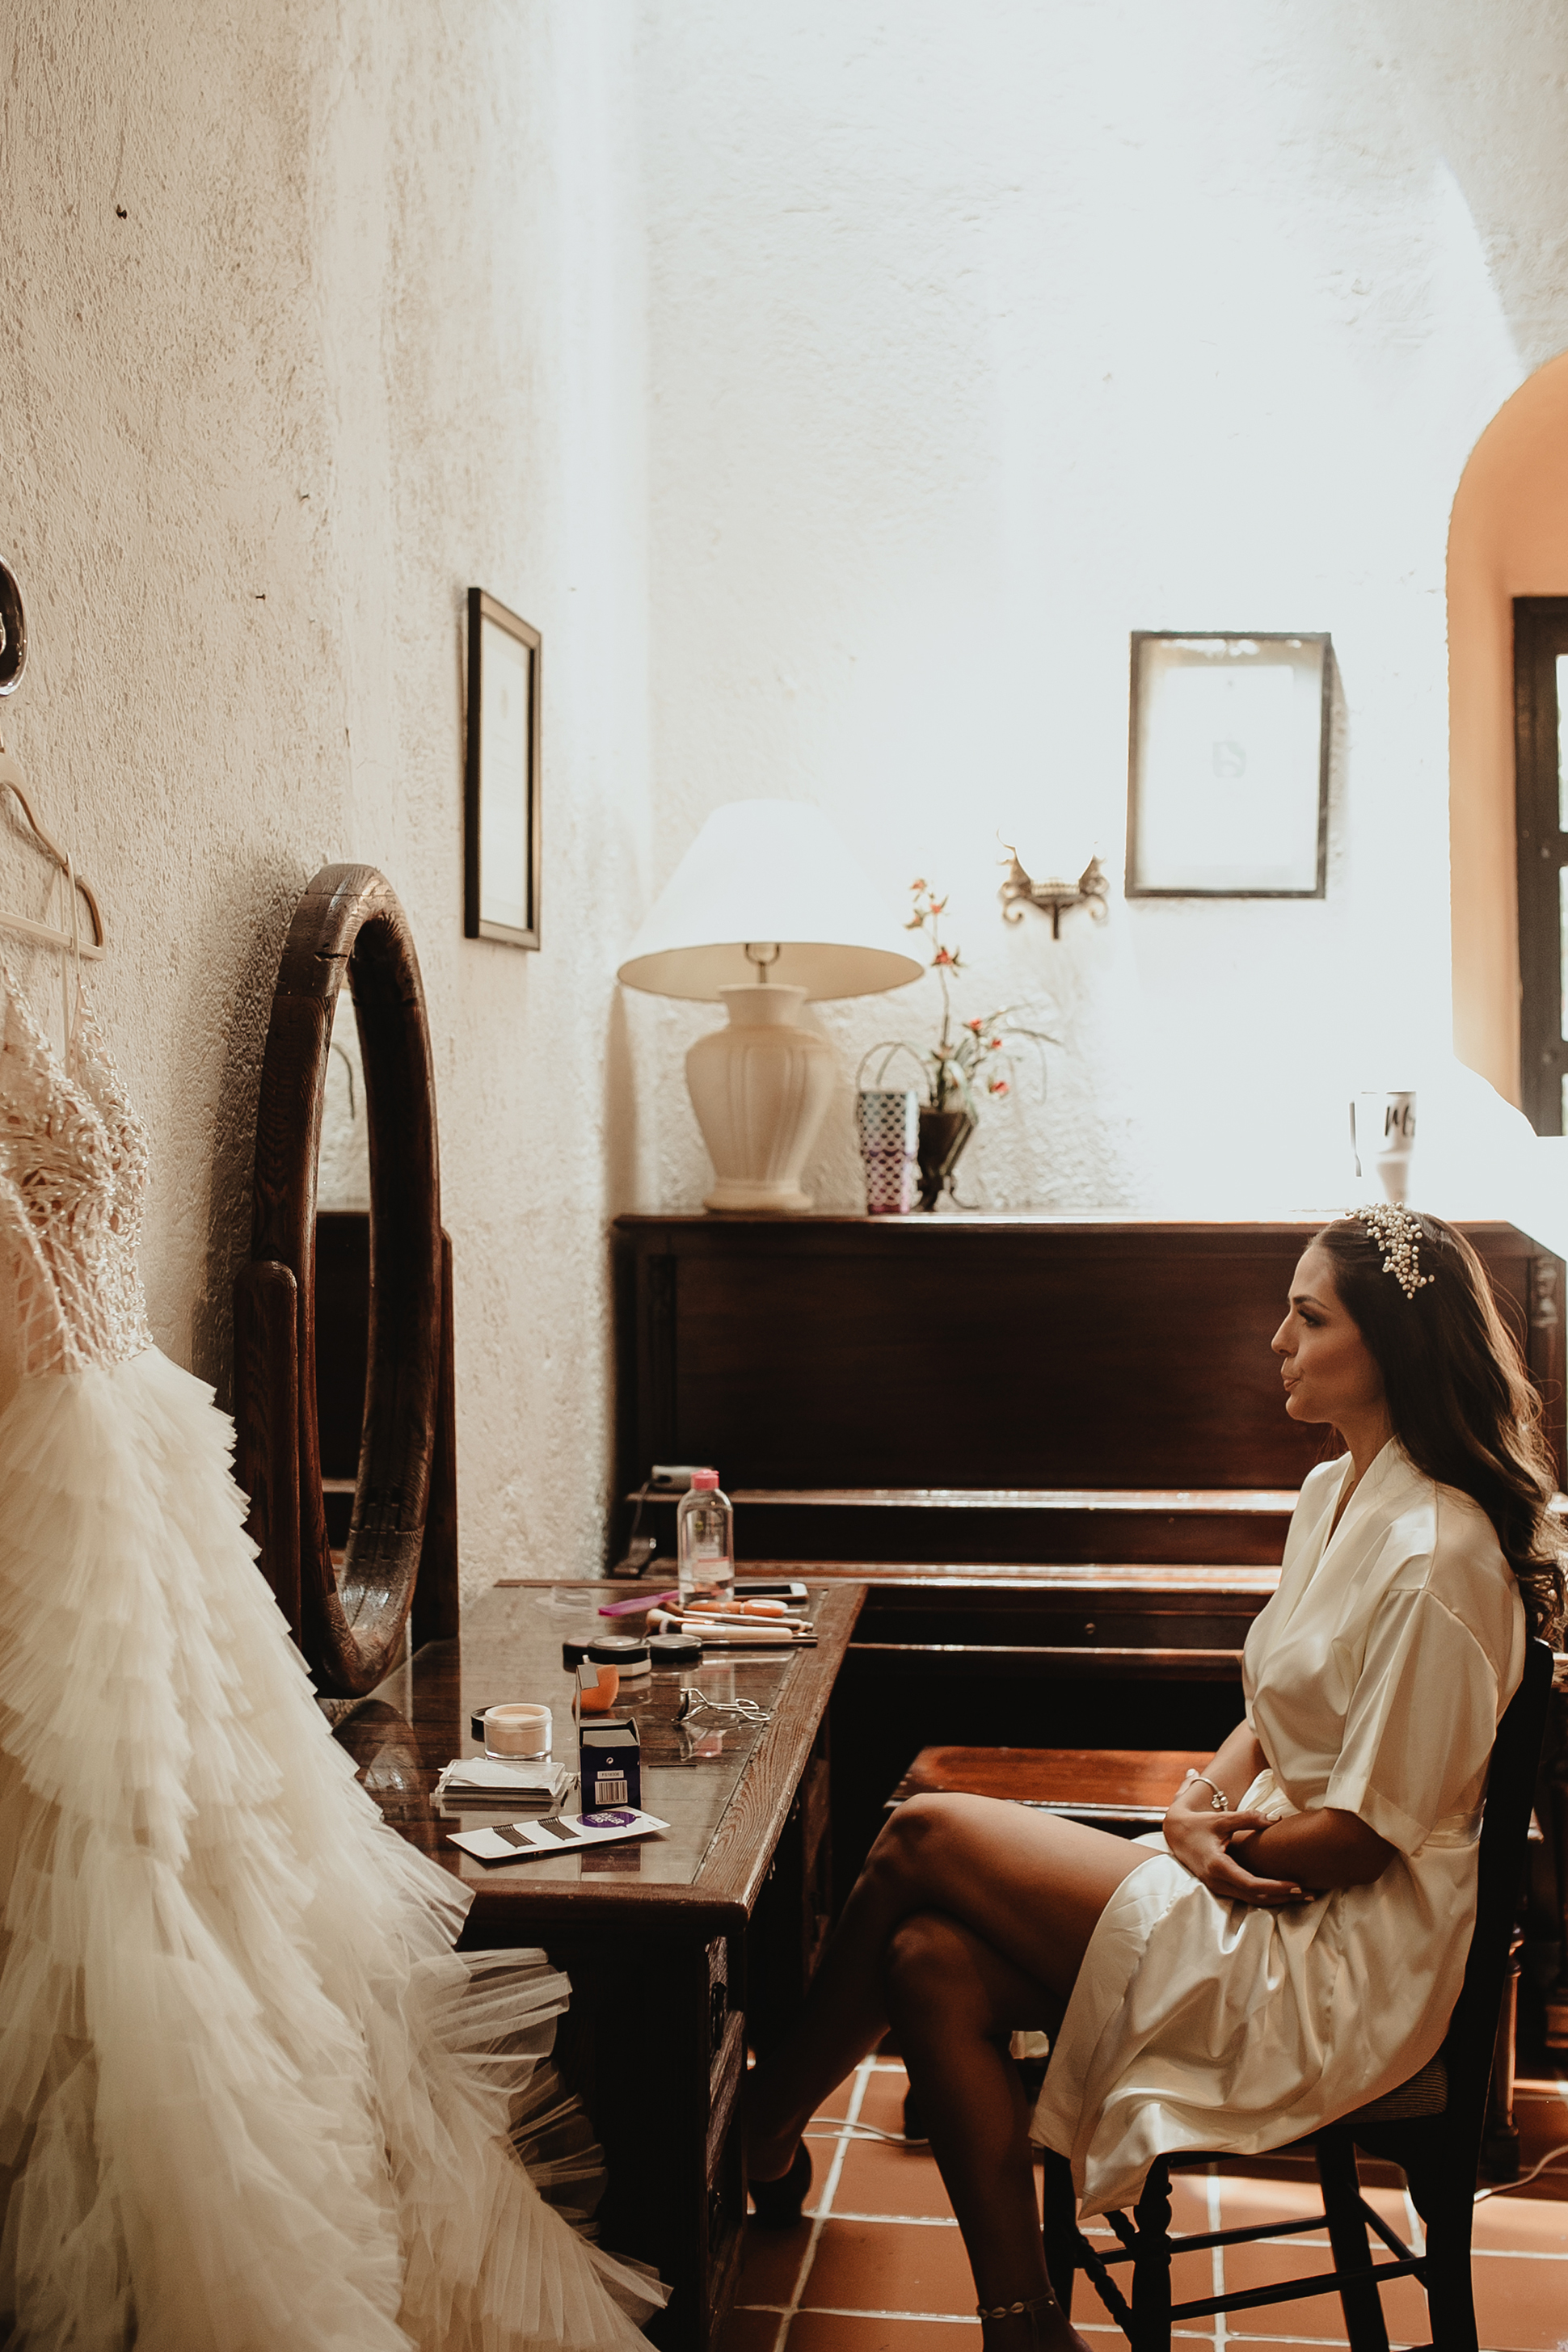 0042R&F__WeddingDestination_Weddingmerida_BodaMexico_FotografoDeBodas_FabrizioSimoneenFotografo.jpg